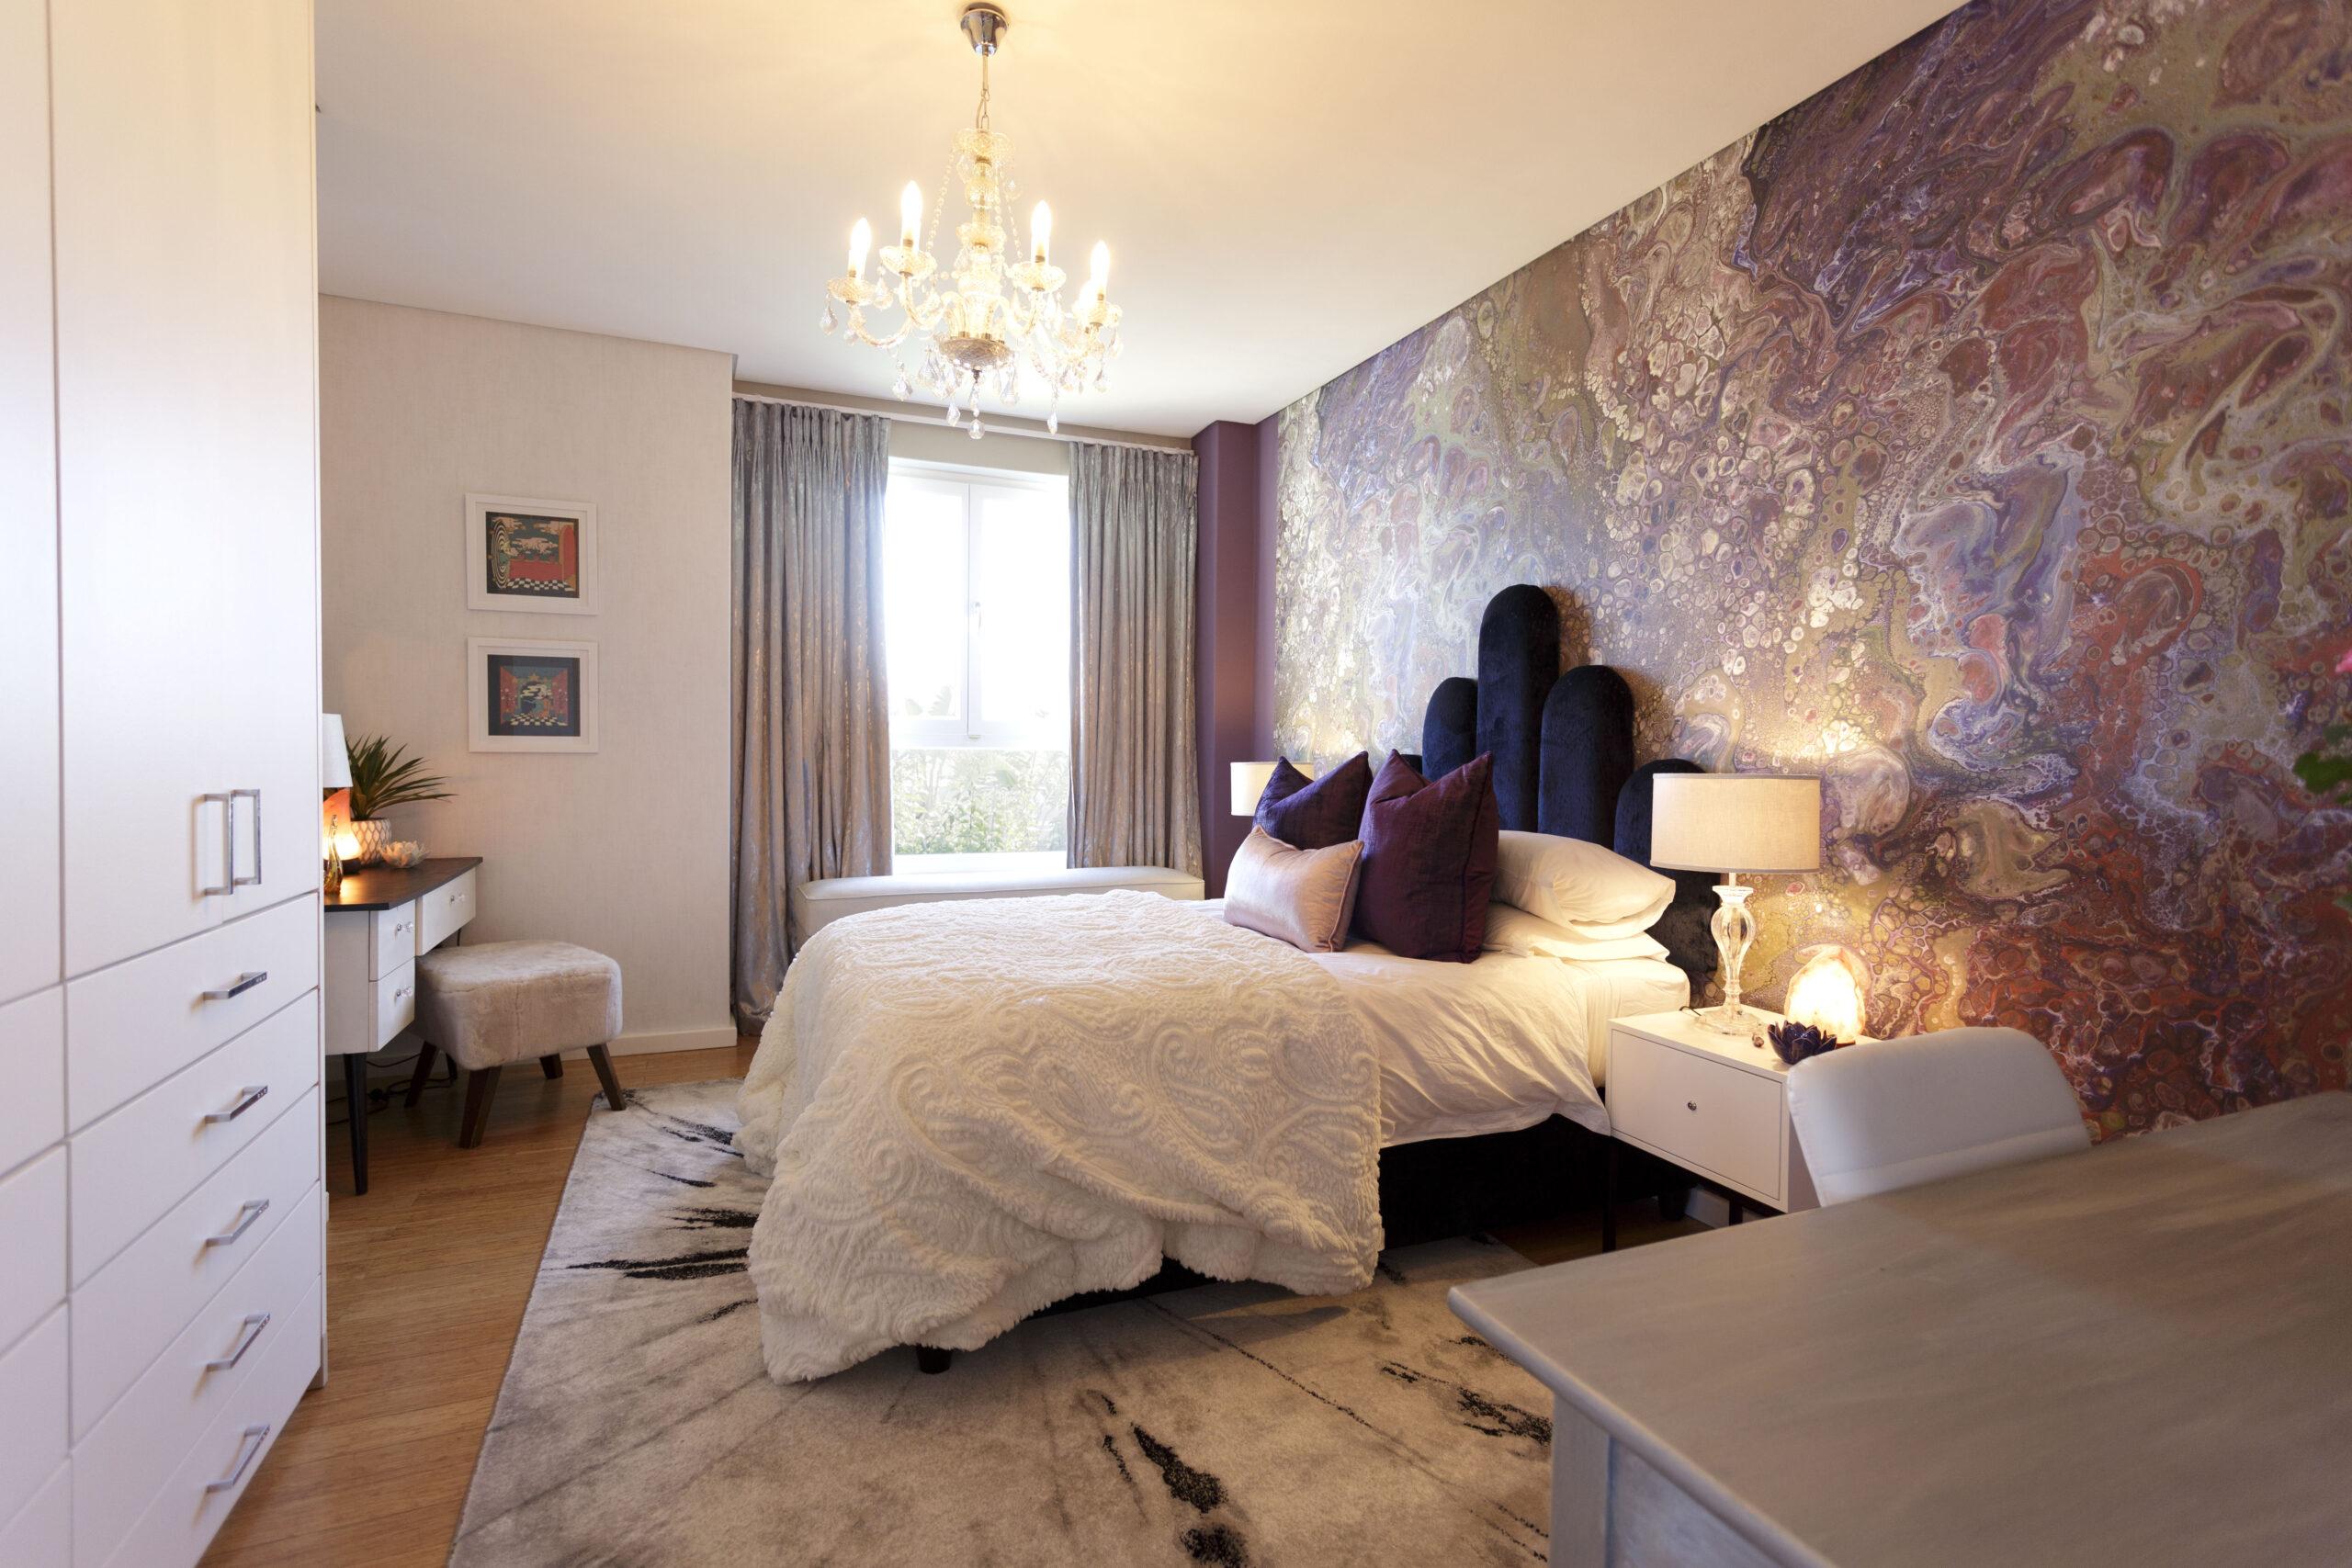 A bedroom oasis